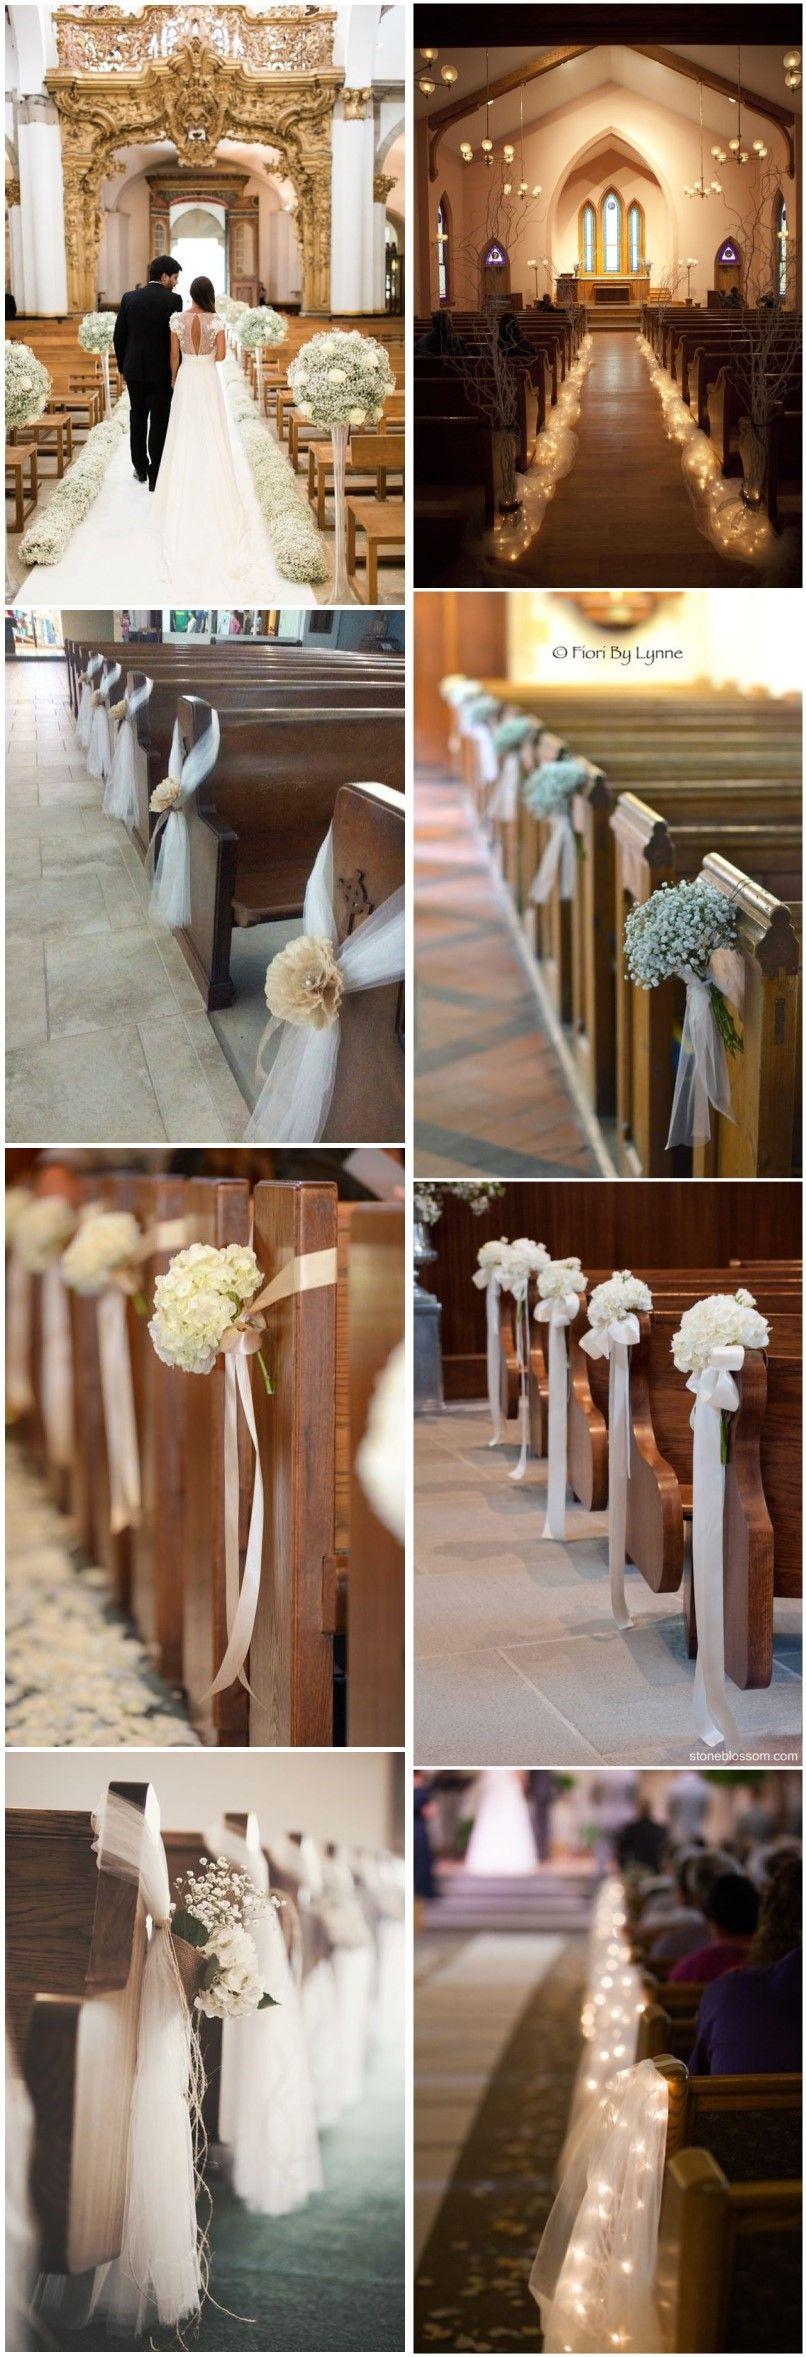 Unique church wedding decoration ideas   Stunning Church Wedding Aisle Decoration Ideas to Steal  Church